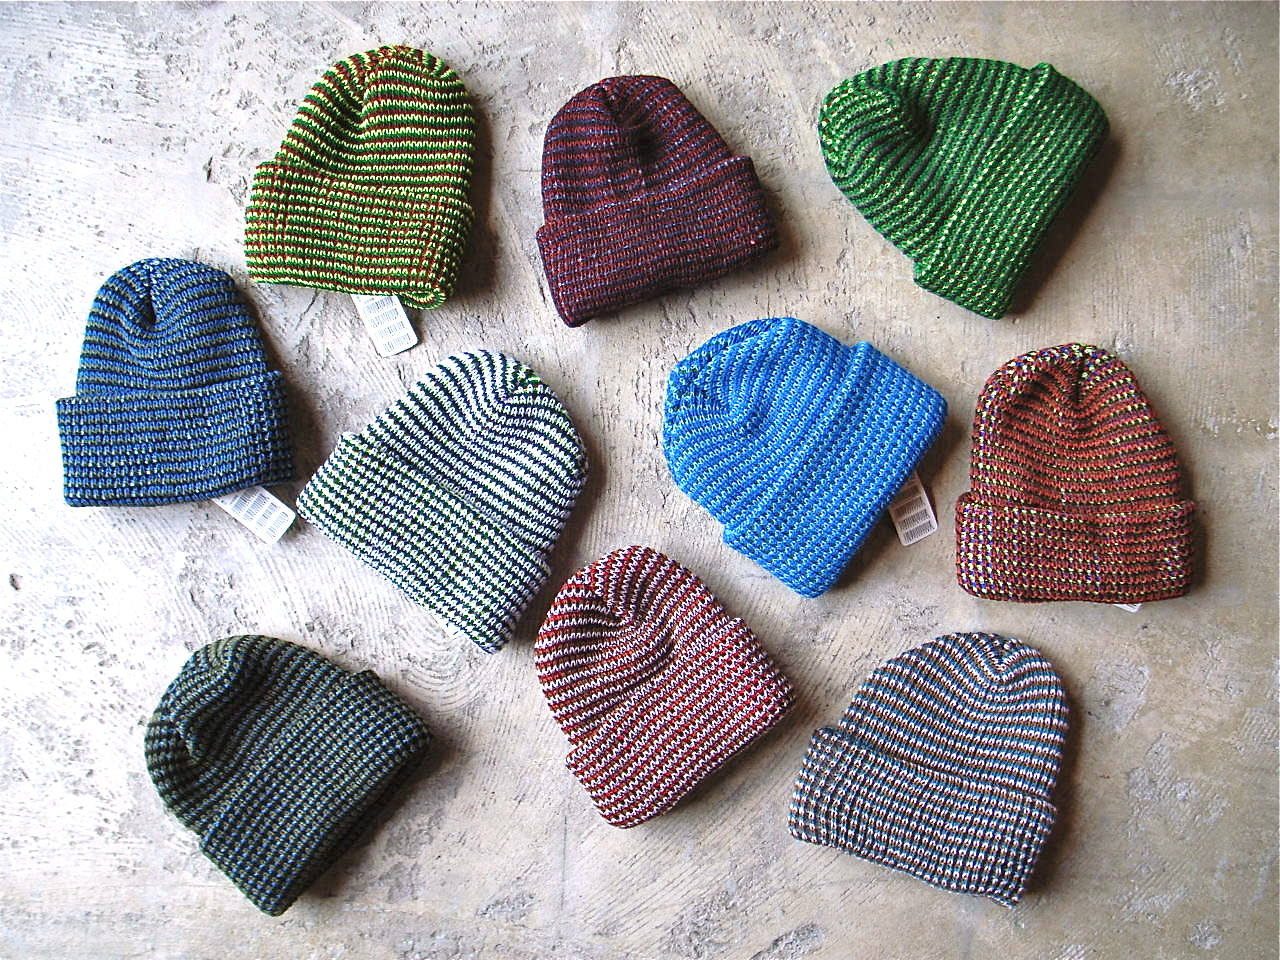 Chicago Knitting Mills : Hardwick knitting mill in gilbertville ma an abandoned